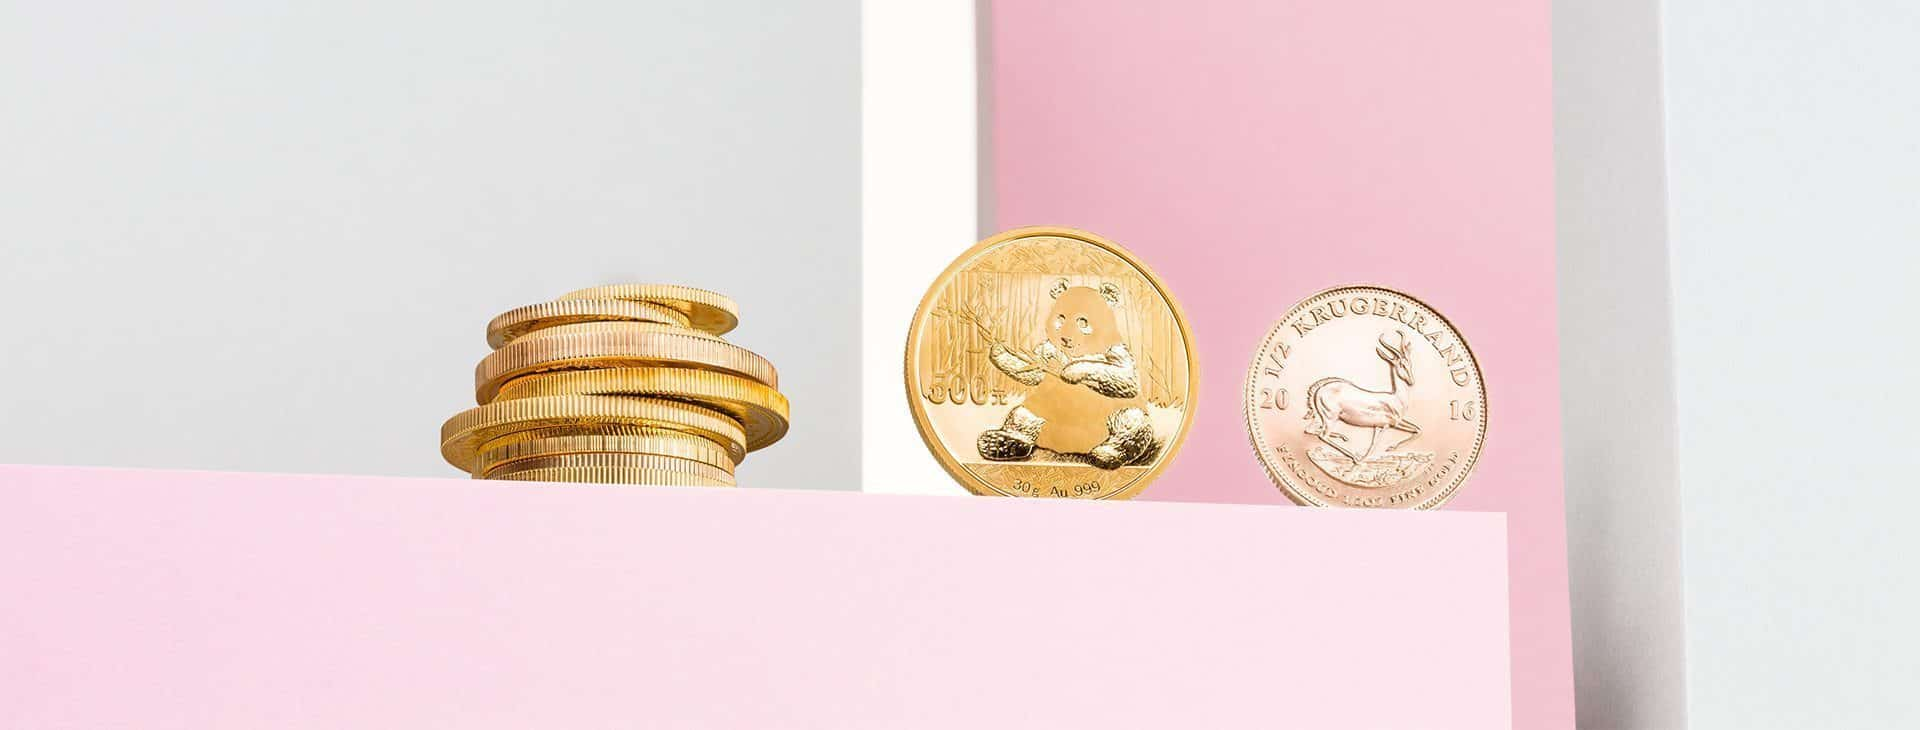 Wiener Philharmoniker Goldmünzen kaufen